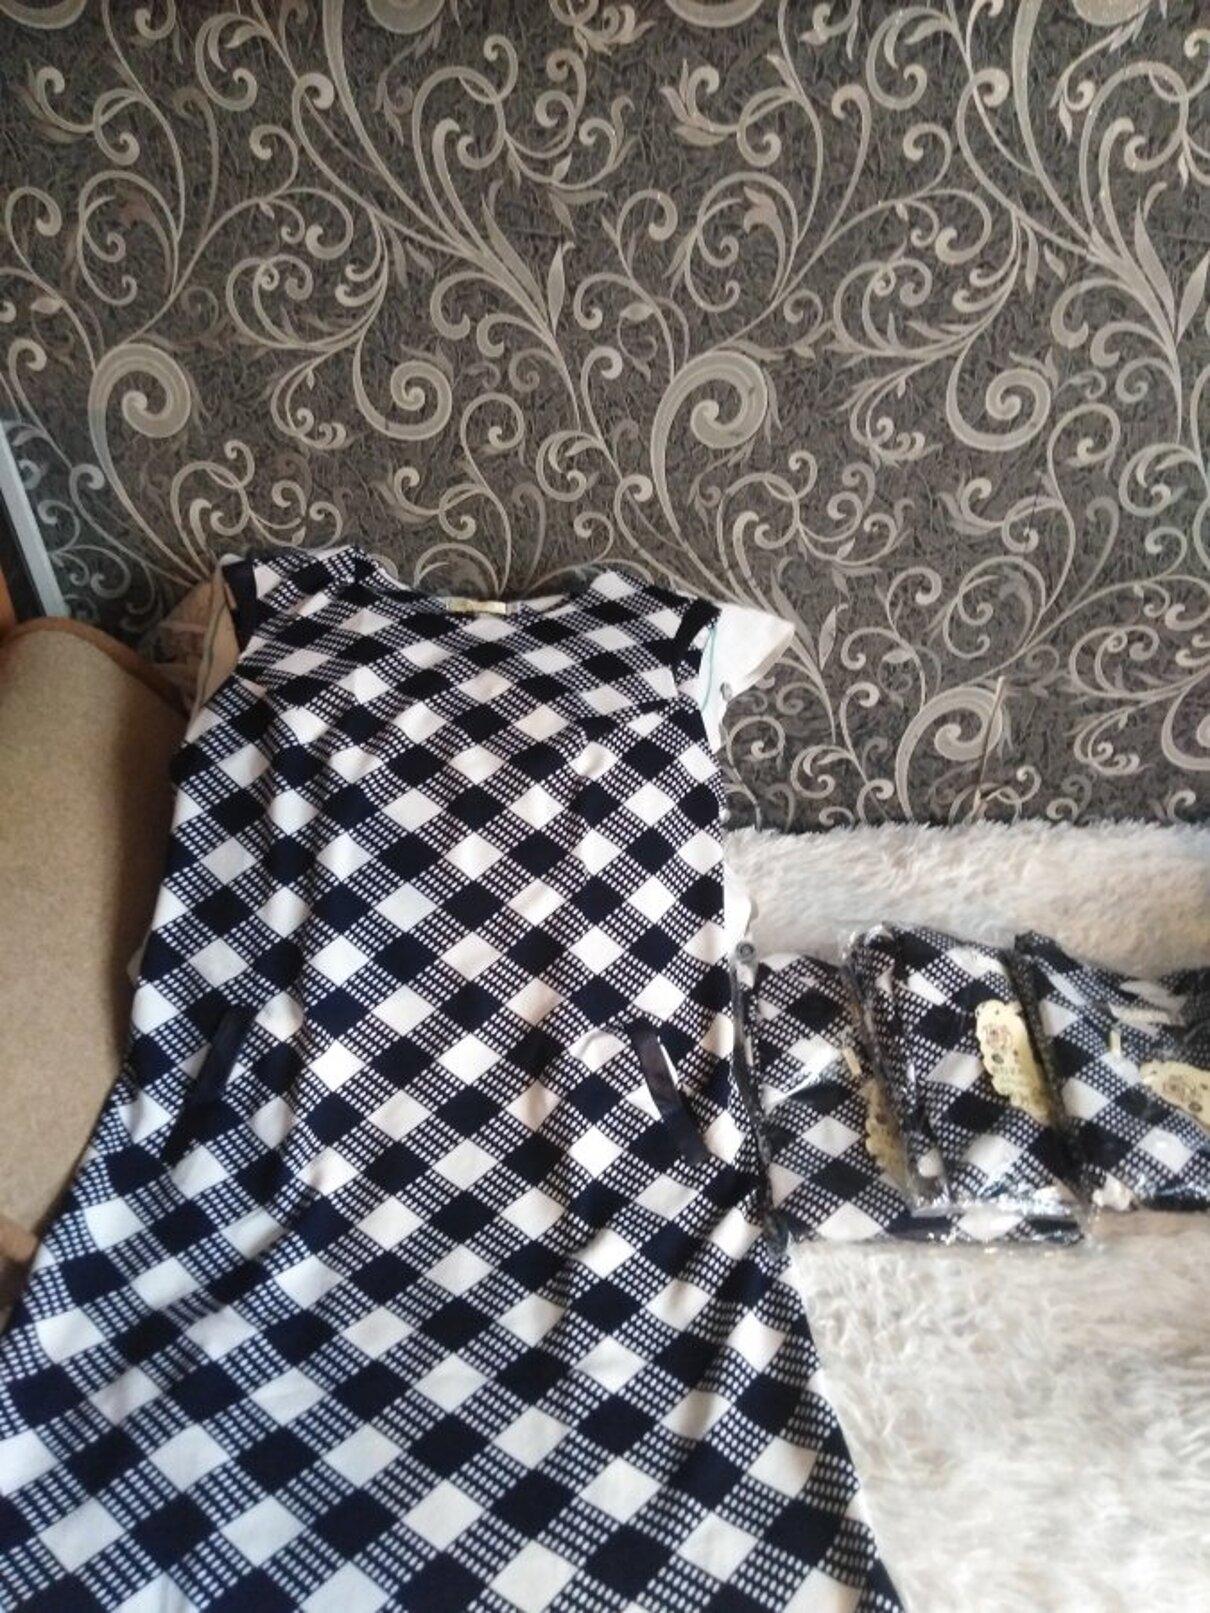 Жалоба-отзыв: DressMe - Мошенники - Интернет-магазин Dress Mе.  Фото №1